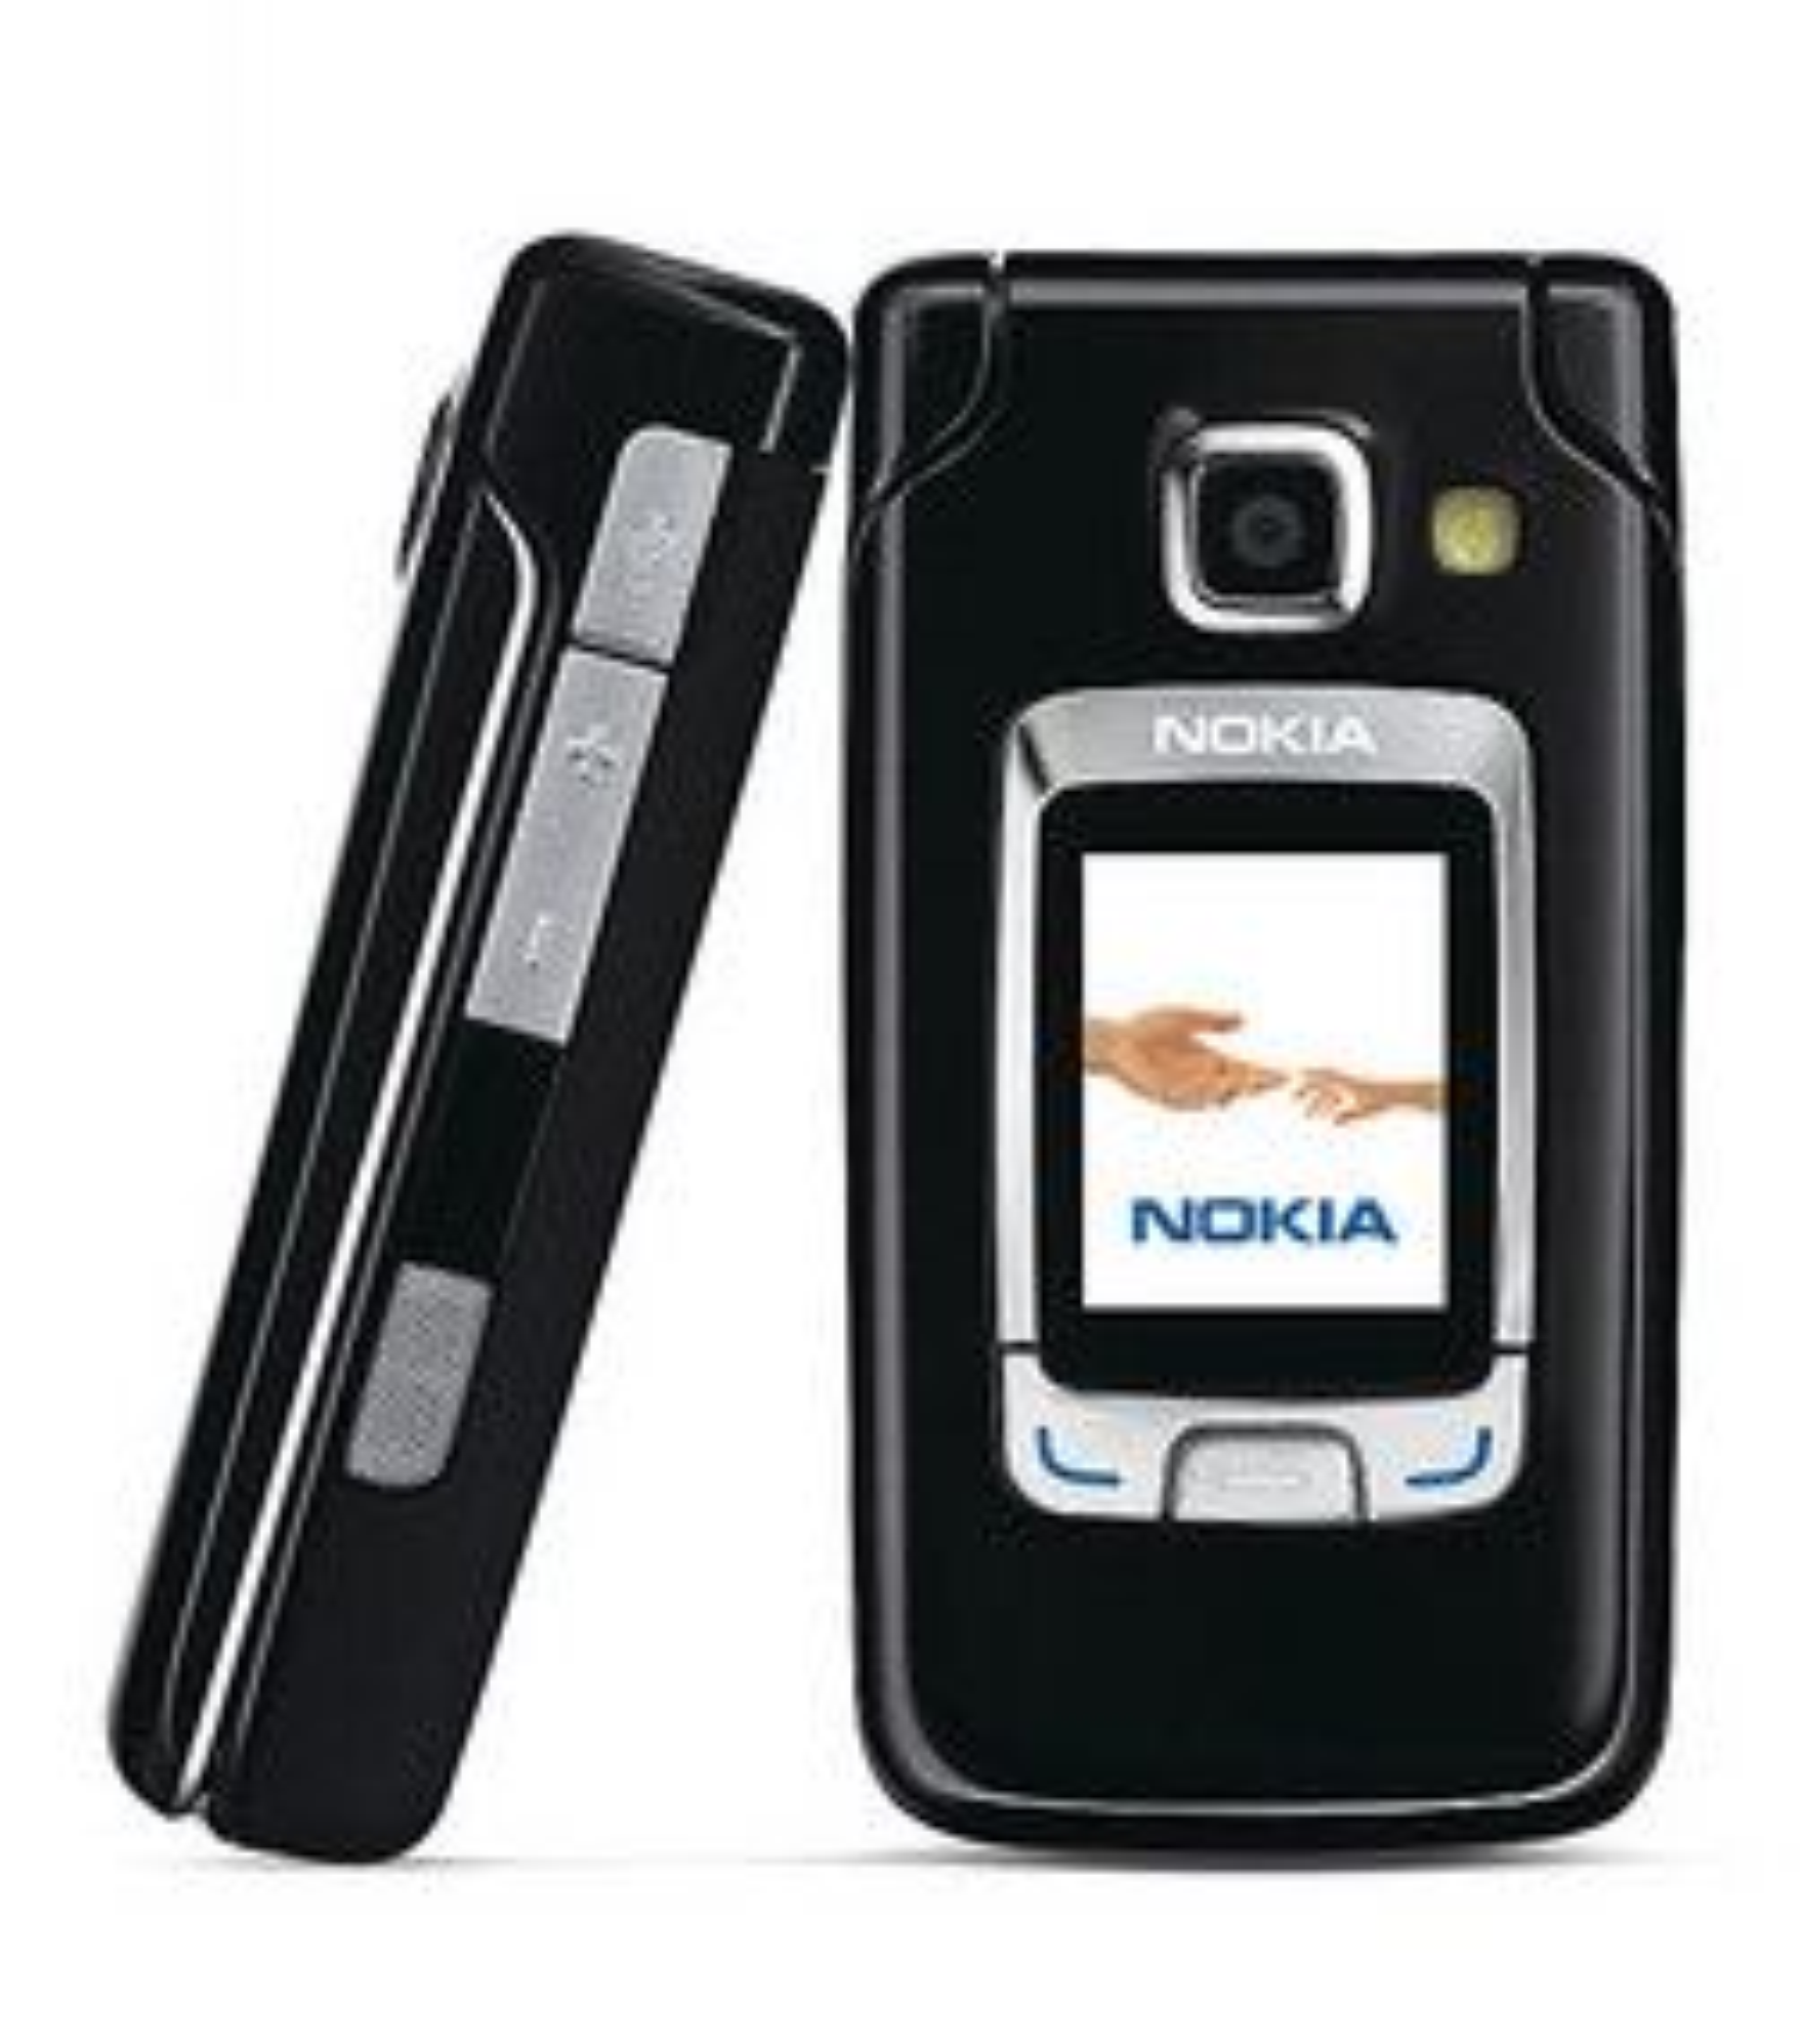 Nok en smarttelefon fra Nokia.